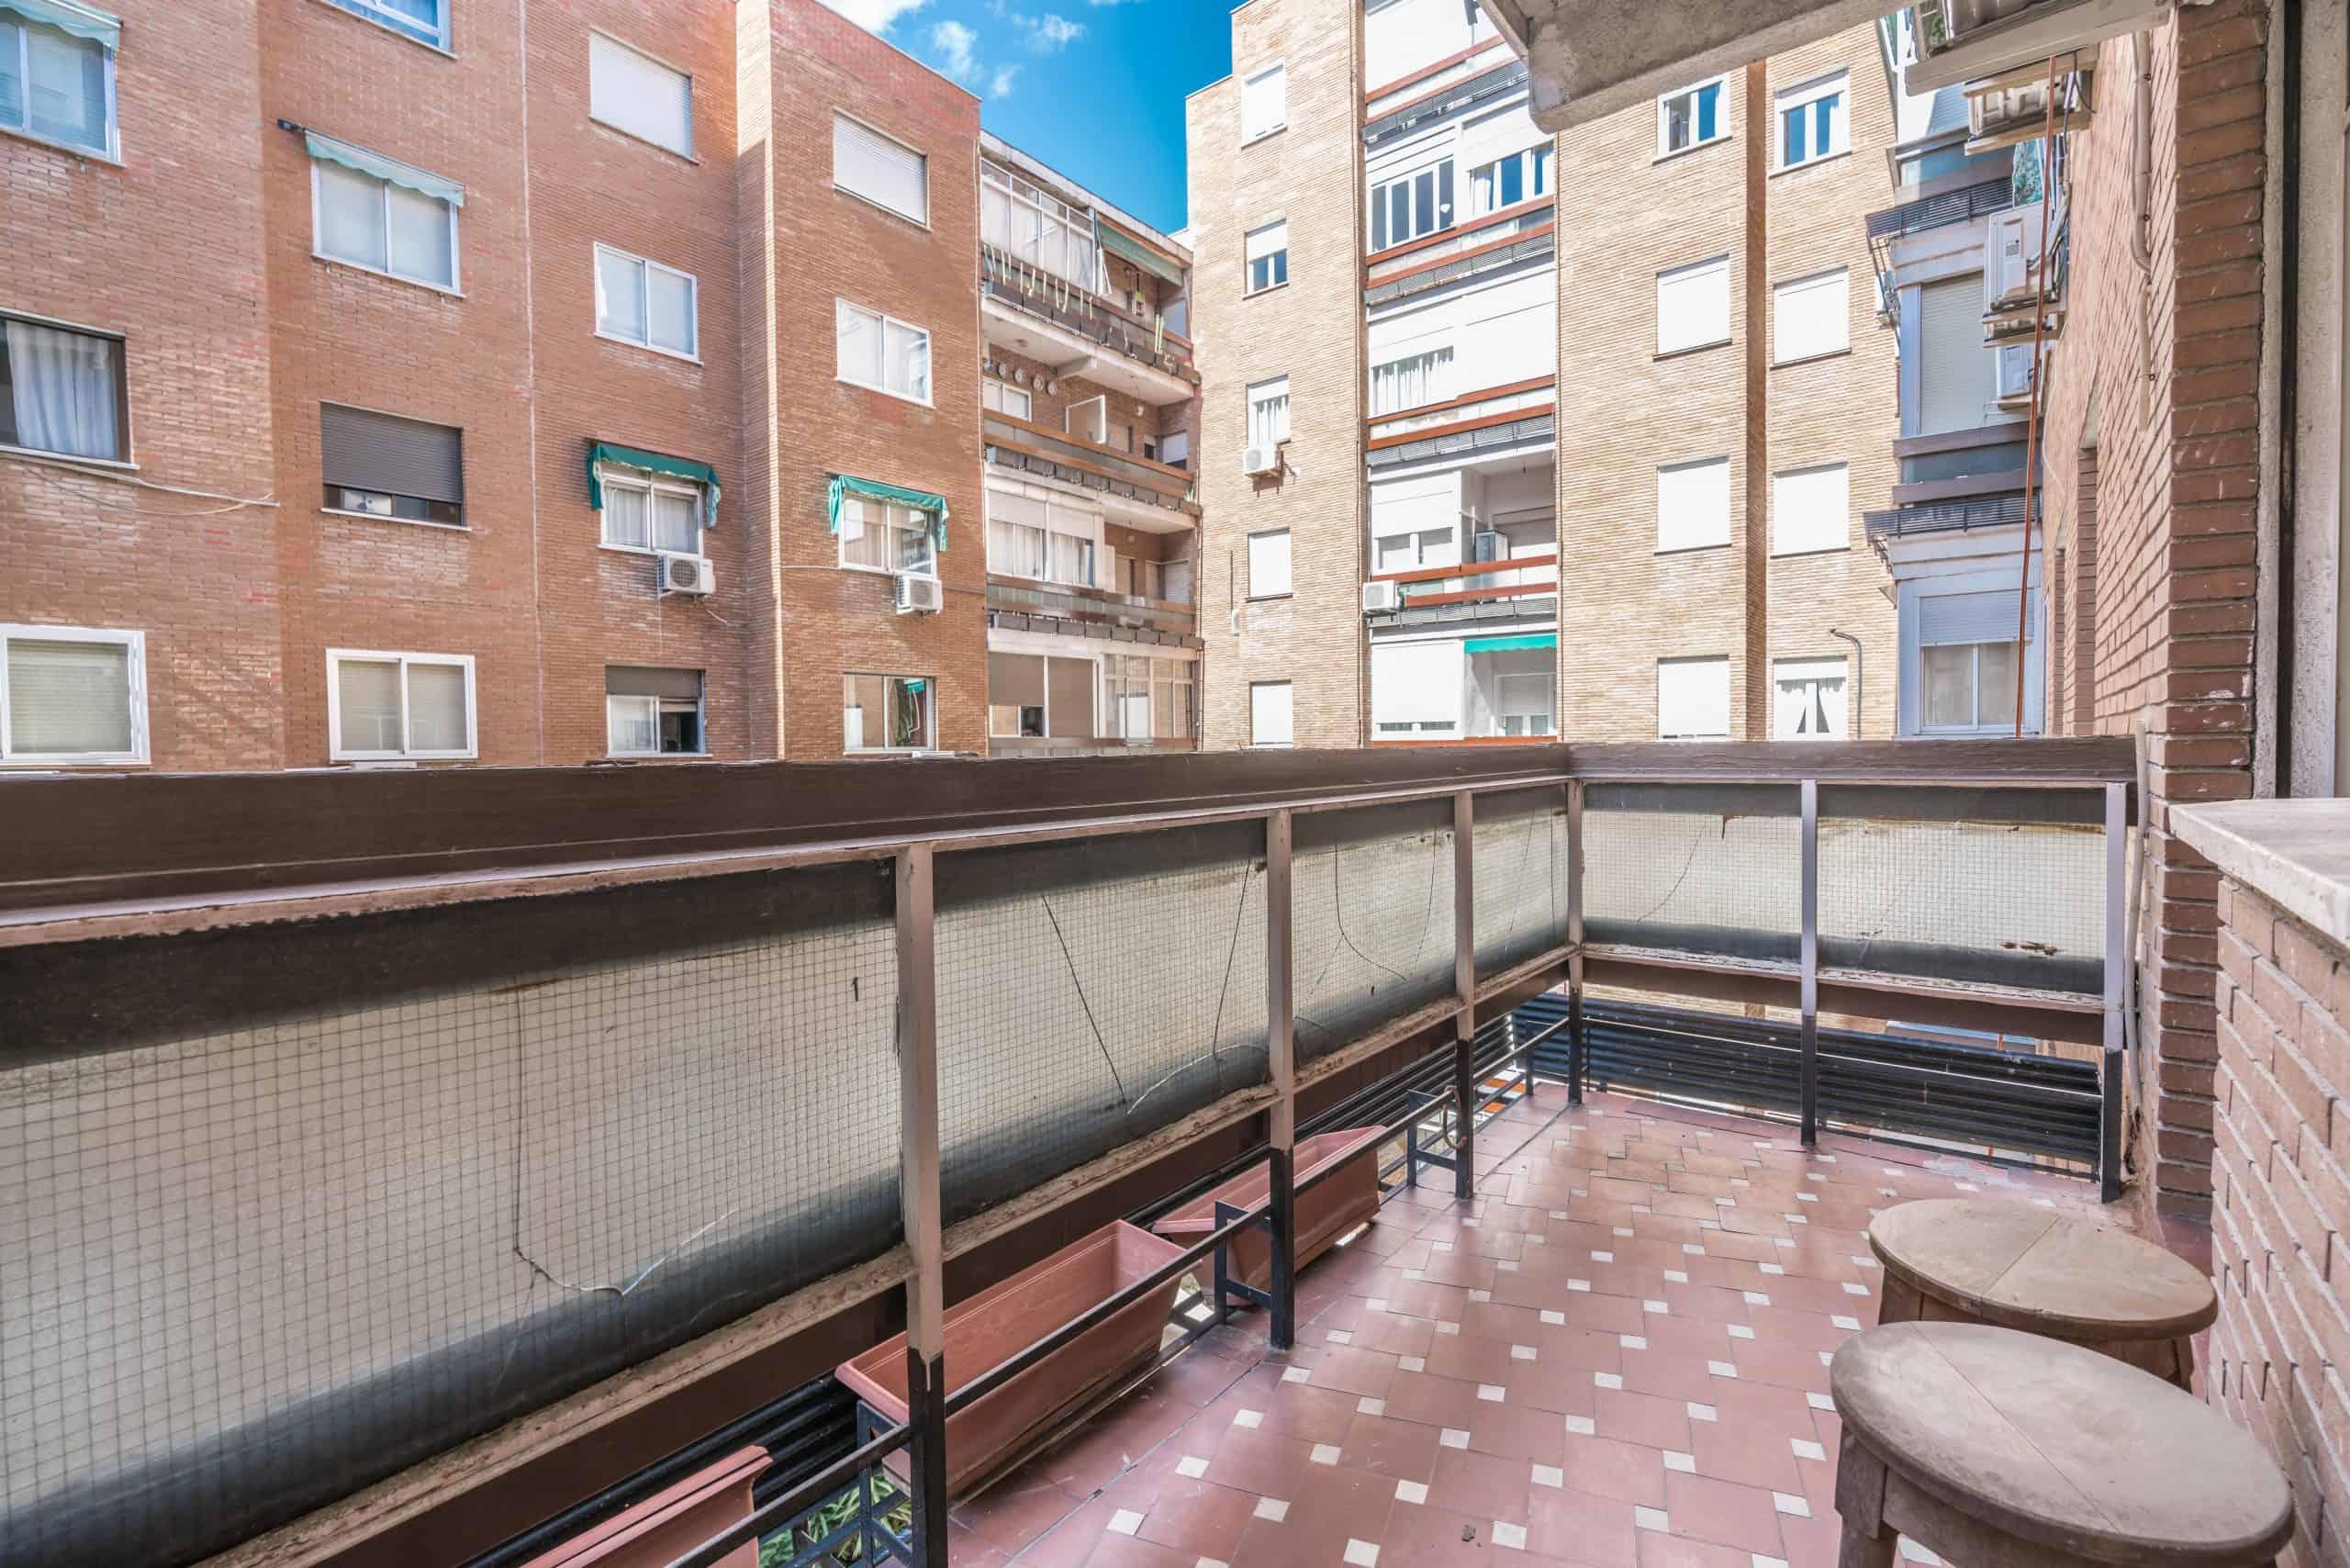 Agencia Inmobiliaria de Madrid-FUTUROCASA-Zona ARGANZUELA-EMBAJADORES-LEGAZPI -calle EMBAJADORES 108-SALON 2-TERRAZA1 TERRAZA3